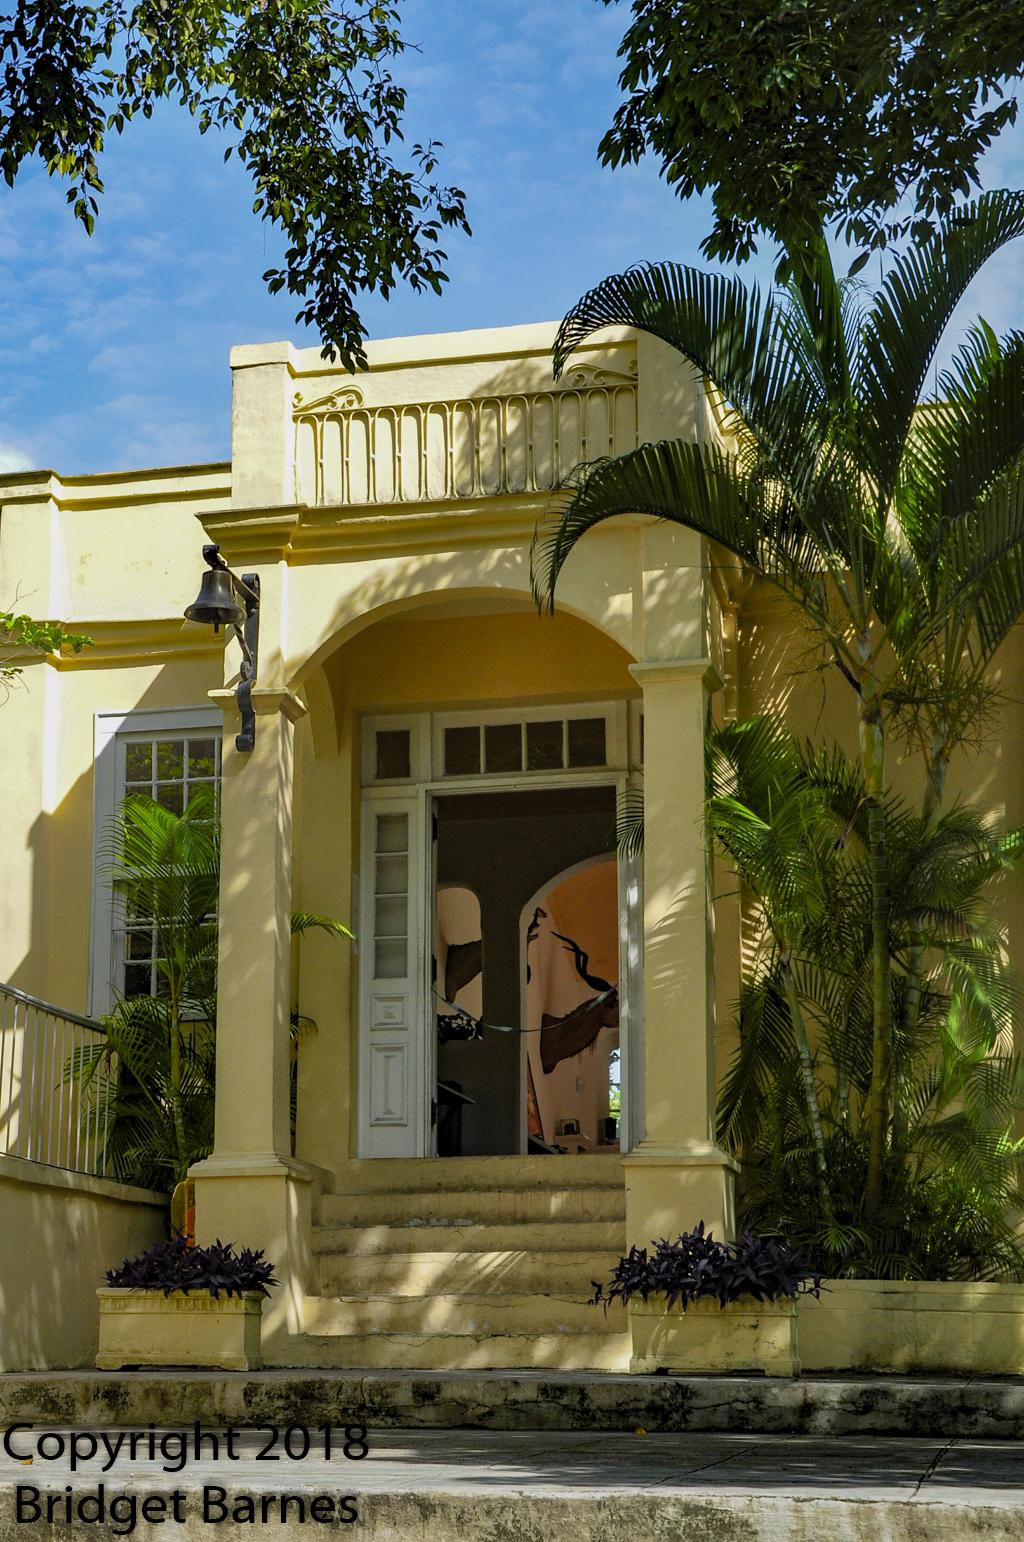 La Finca Vigía, Ernest Hemingway's home, 18 June 2018